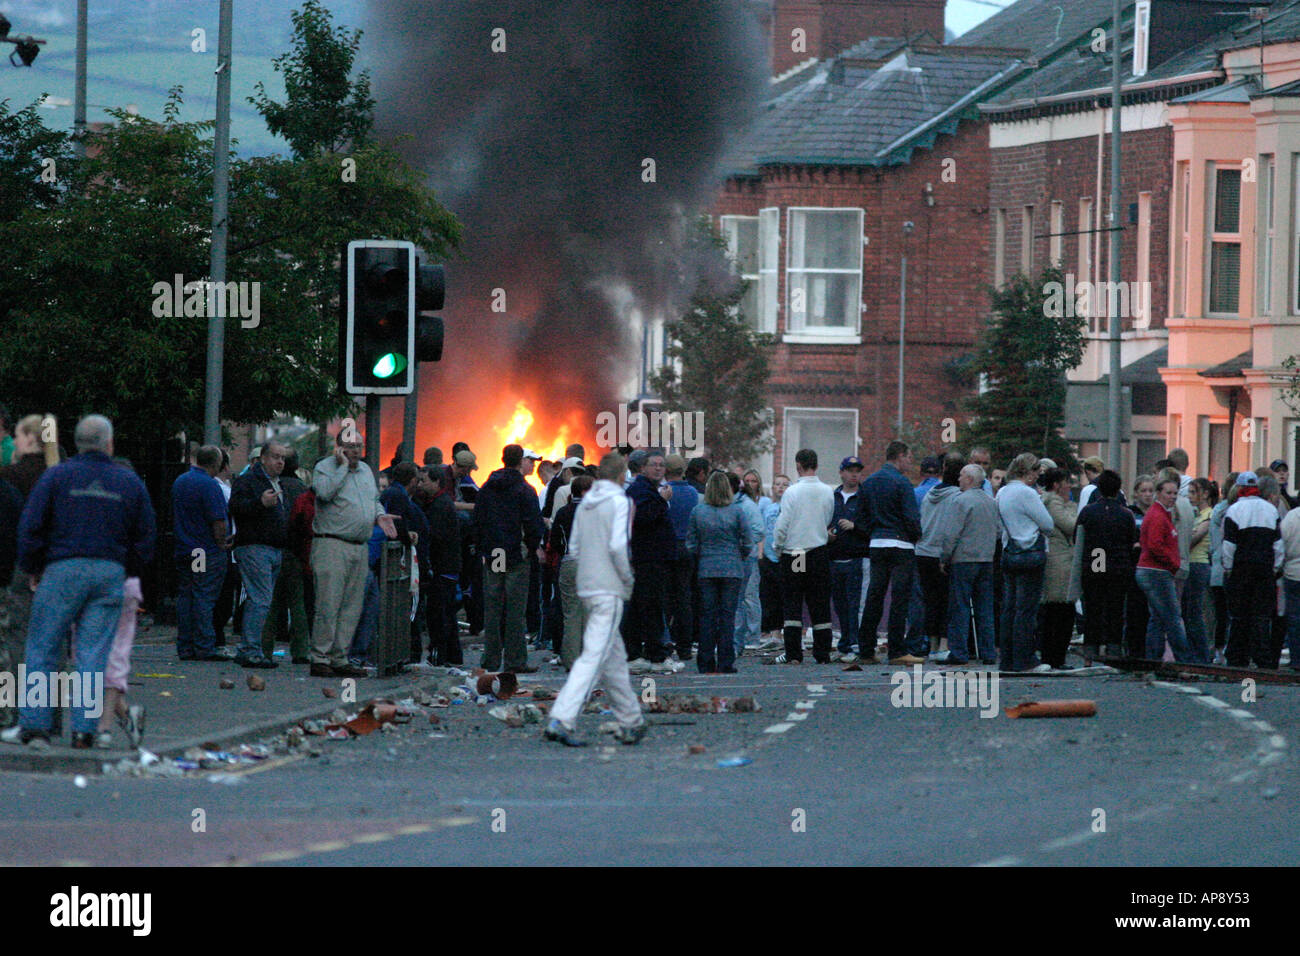 loyalist protestors block the road in front of burning vehicle on the Albertbridge Road Belfast Northern Ireland - Stock Image